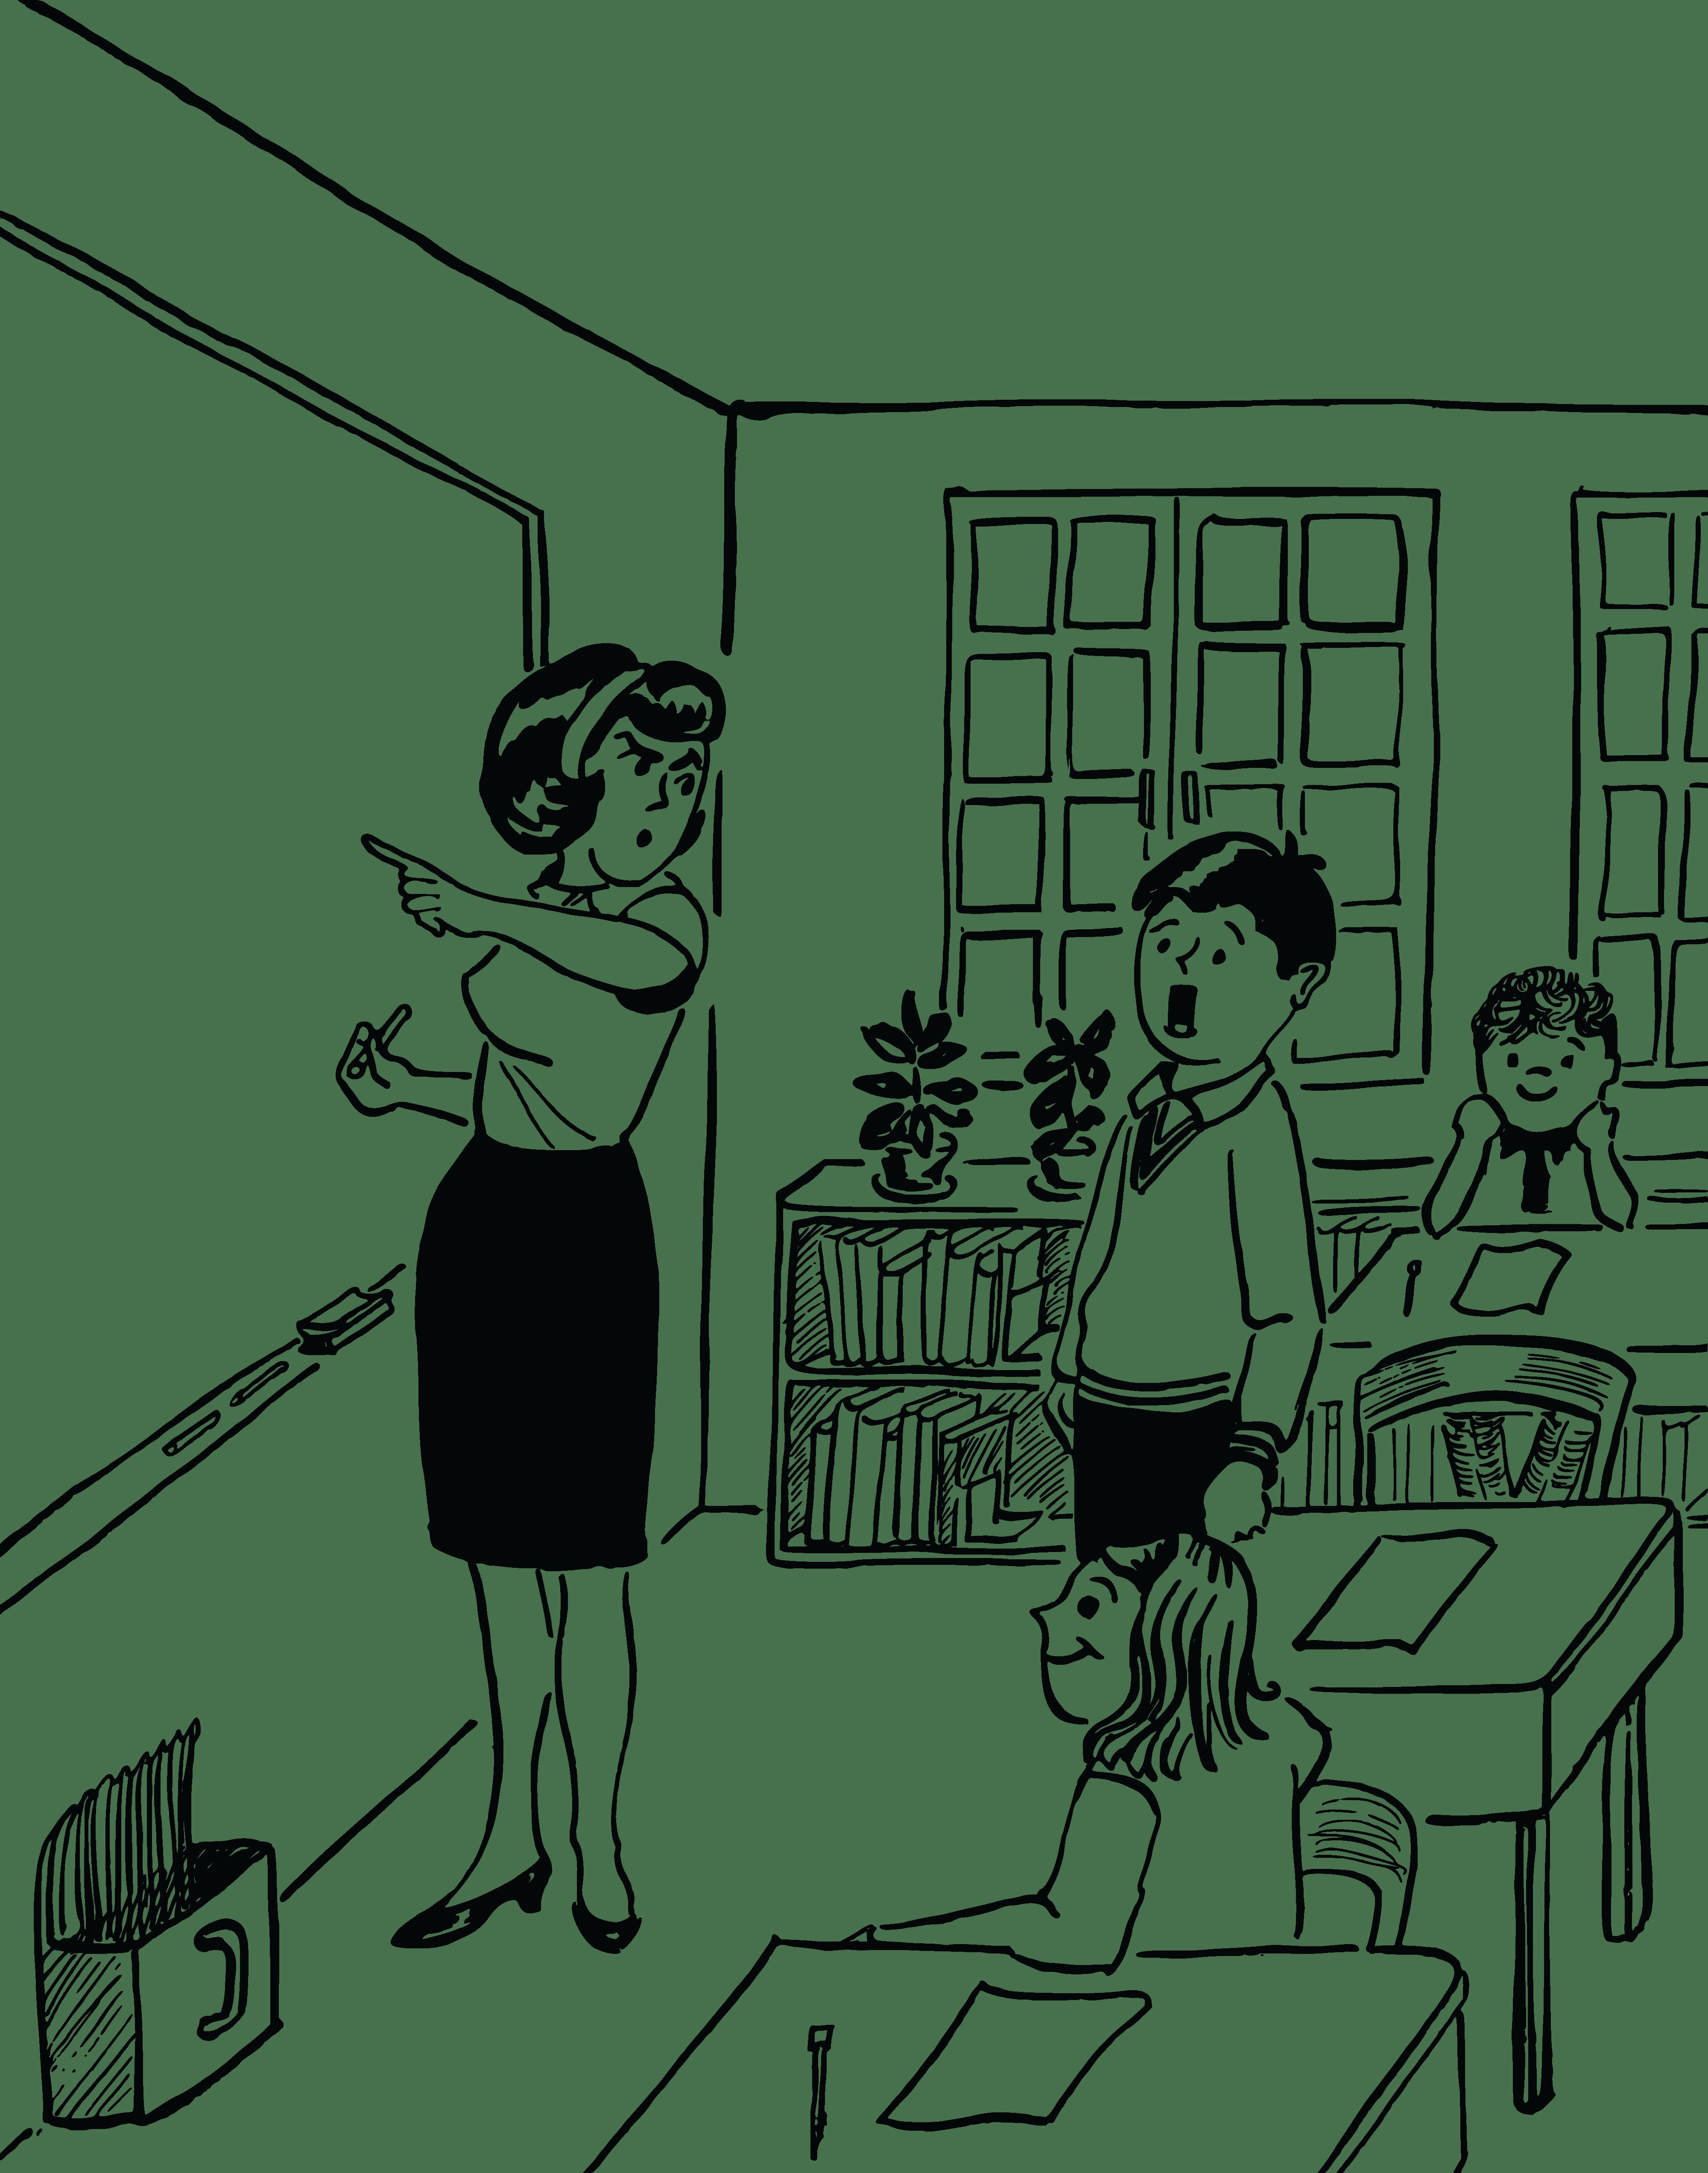 Clipart black and white teacher 7 » Clipart Portal.